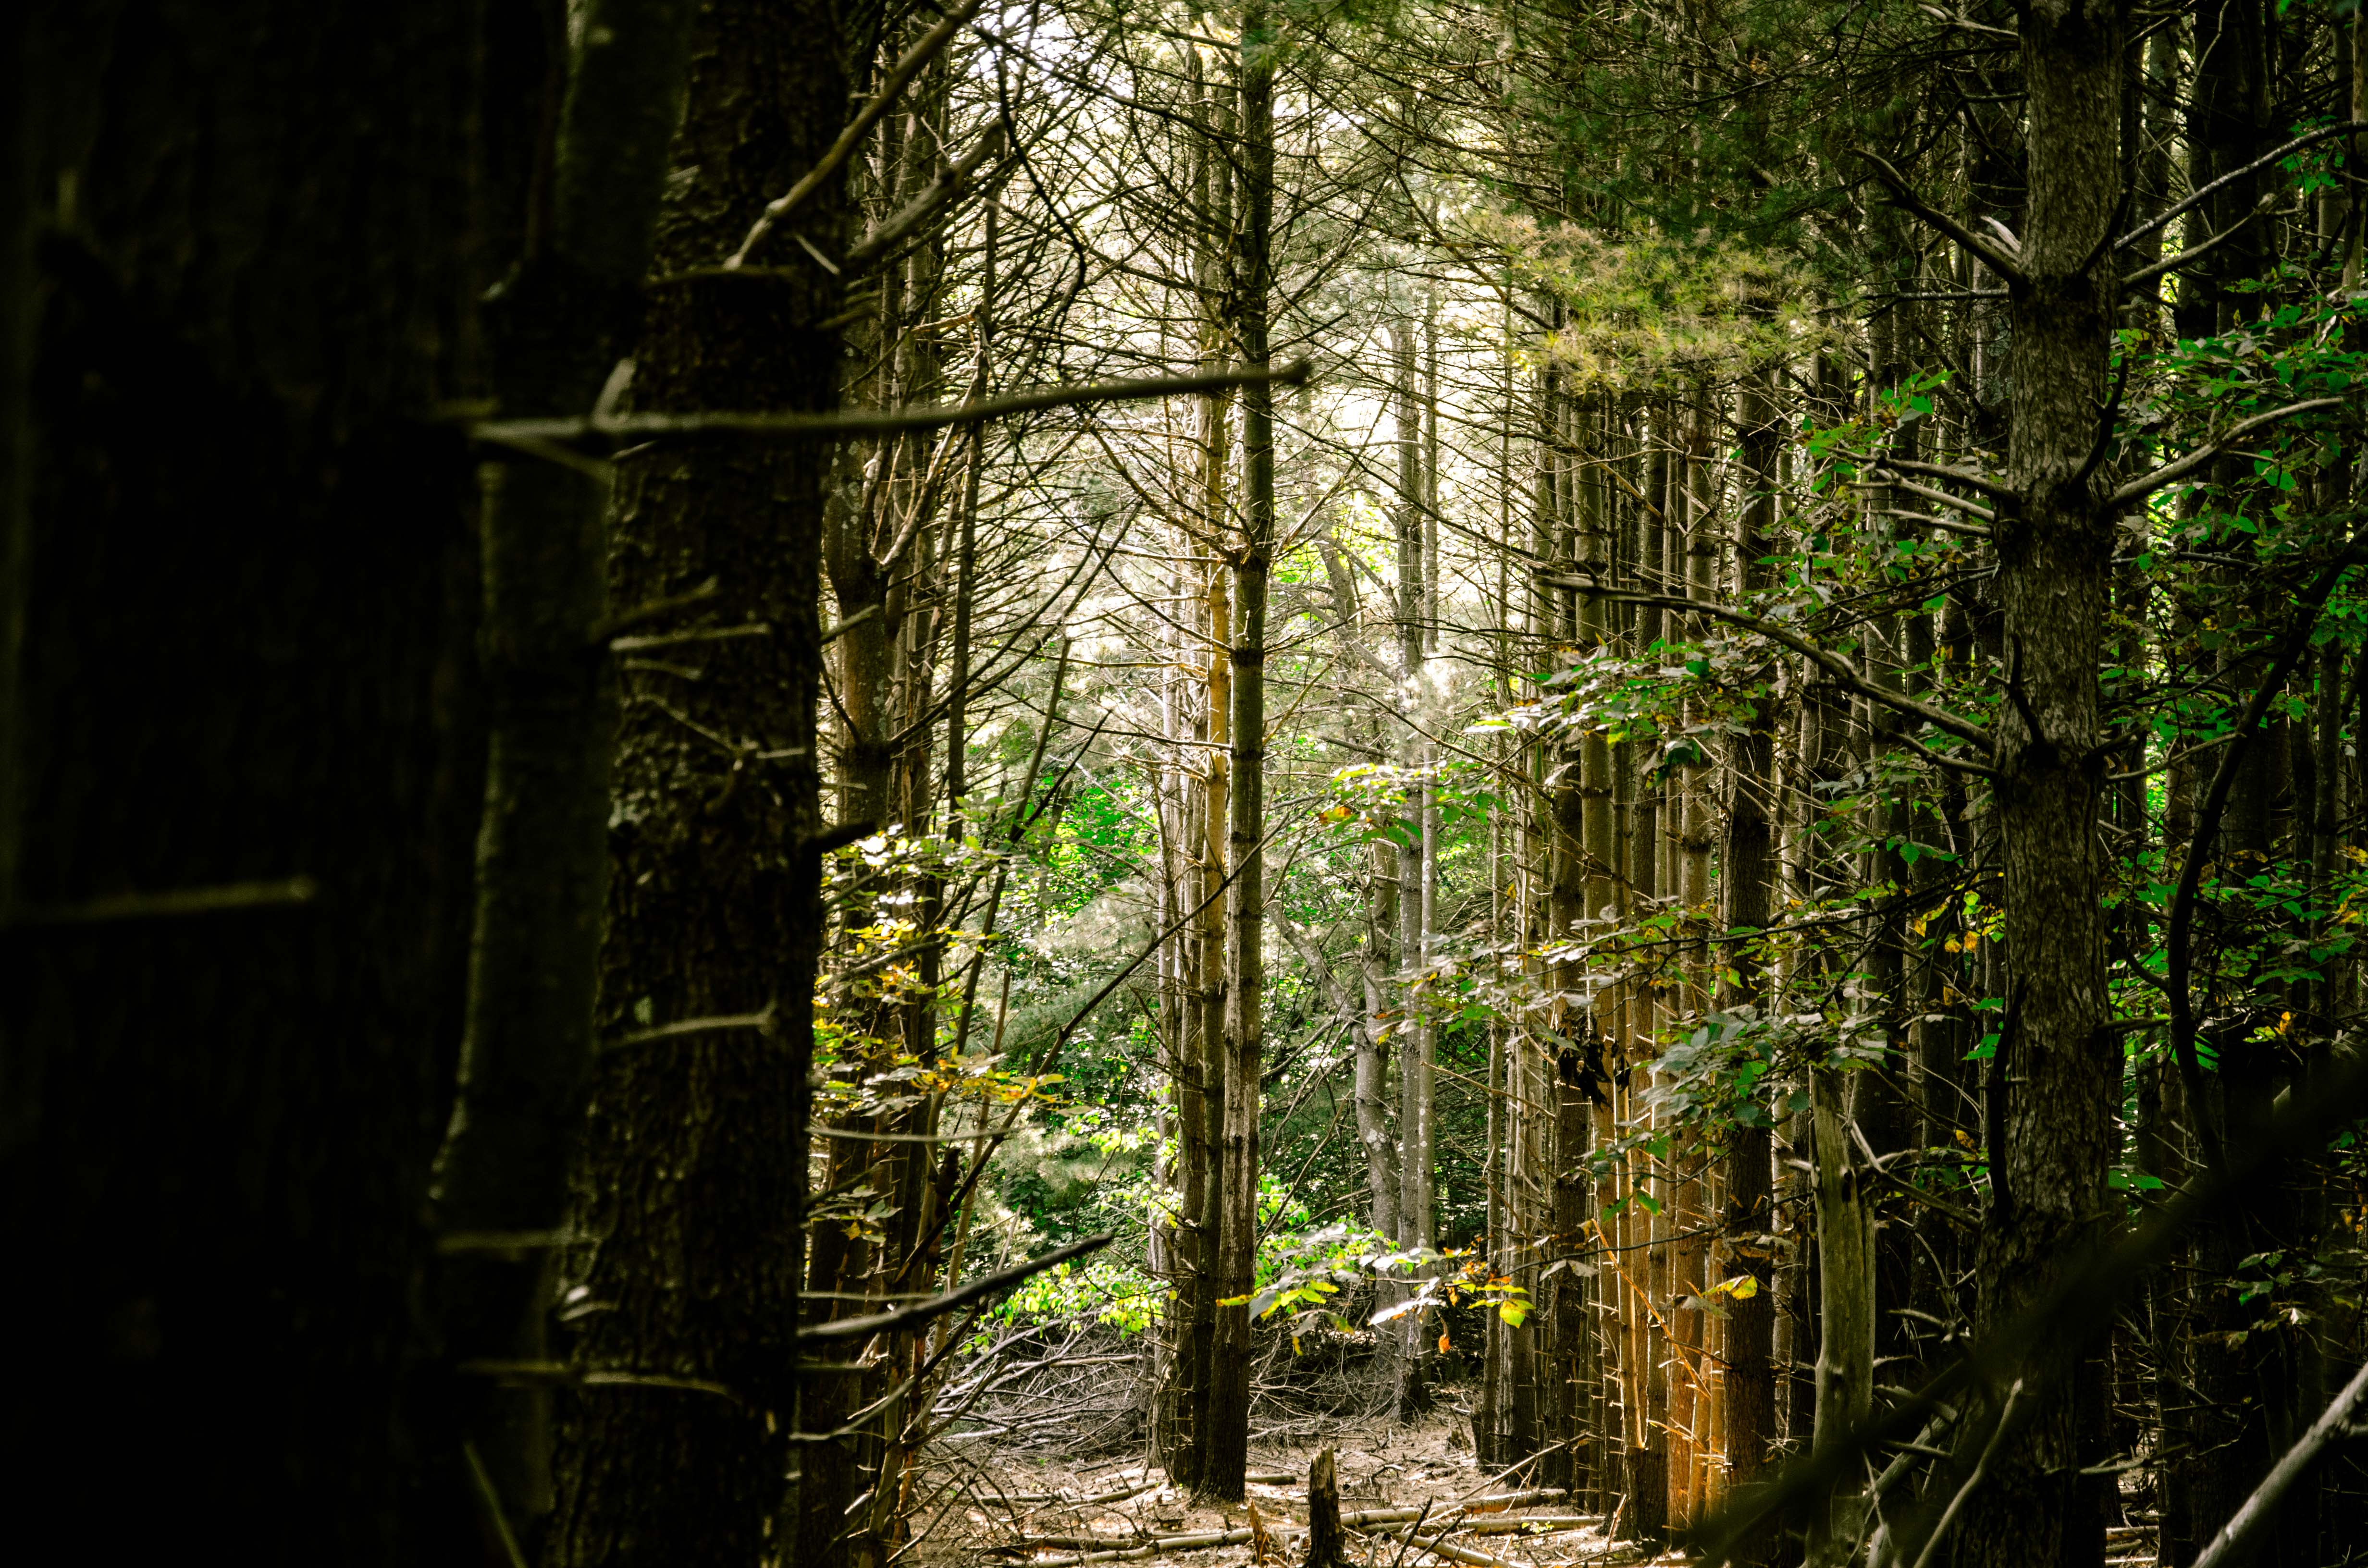 Wildwood State Park